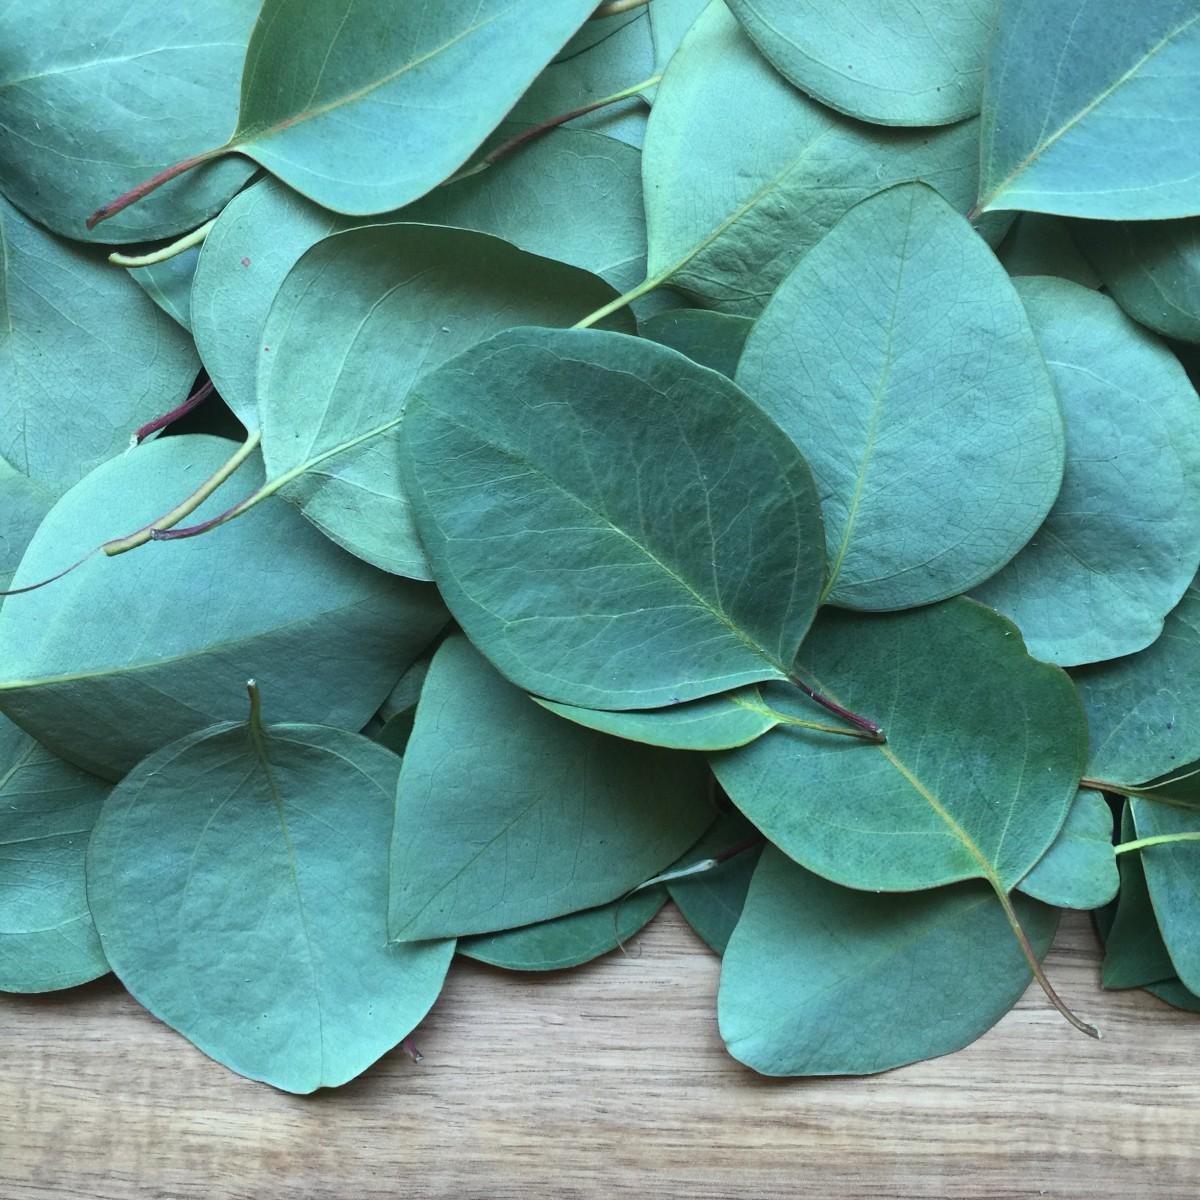 Lemon Eucalyptus Essential Oil: eucalyptus leaves